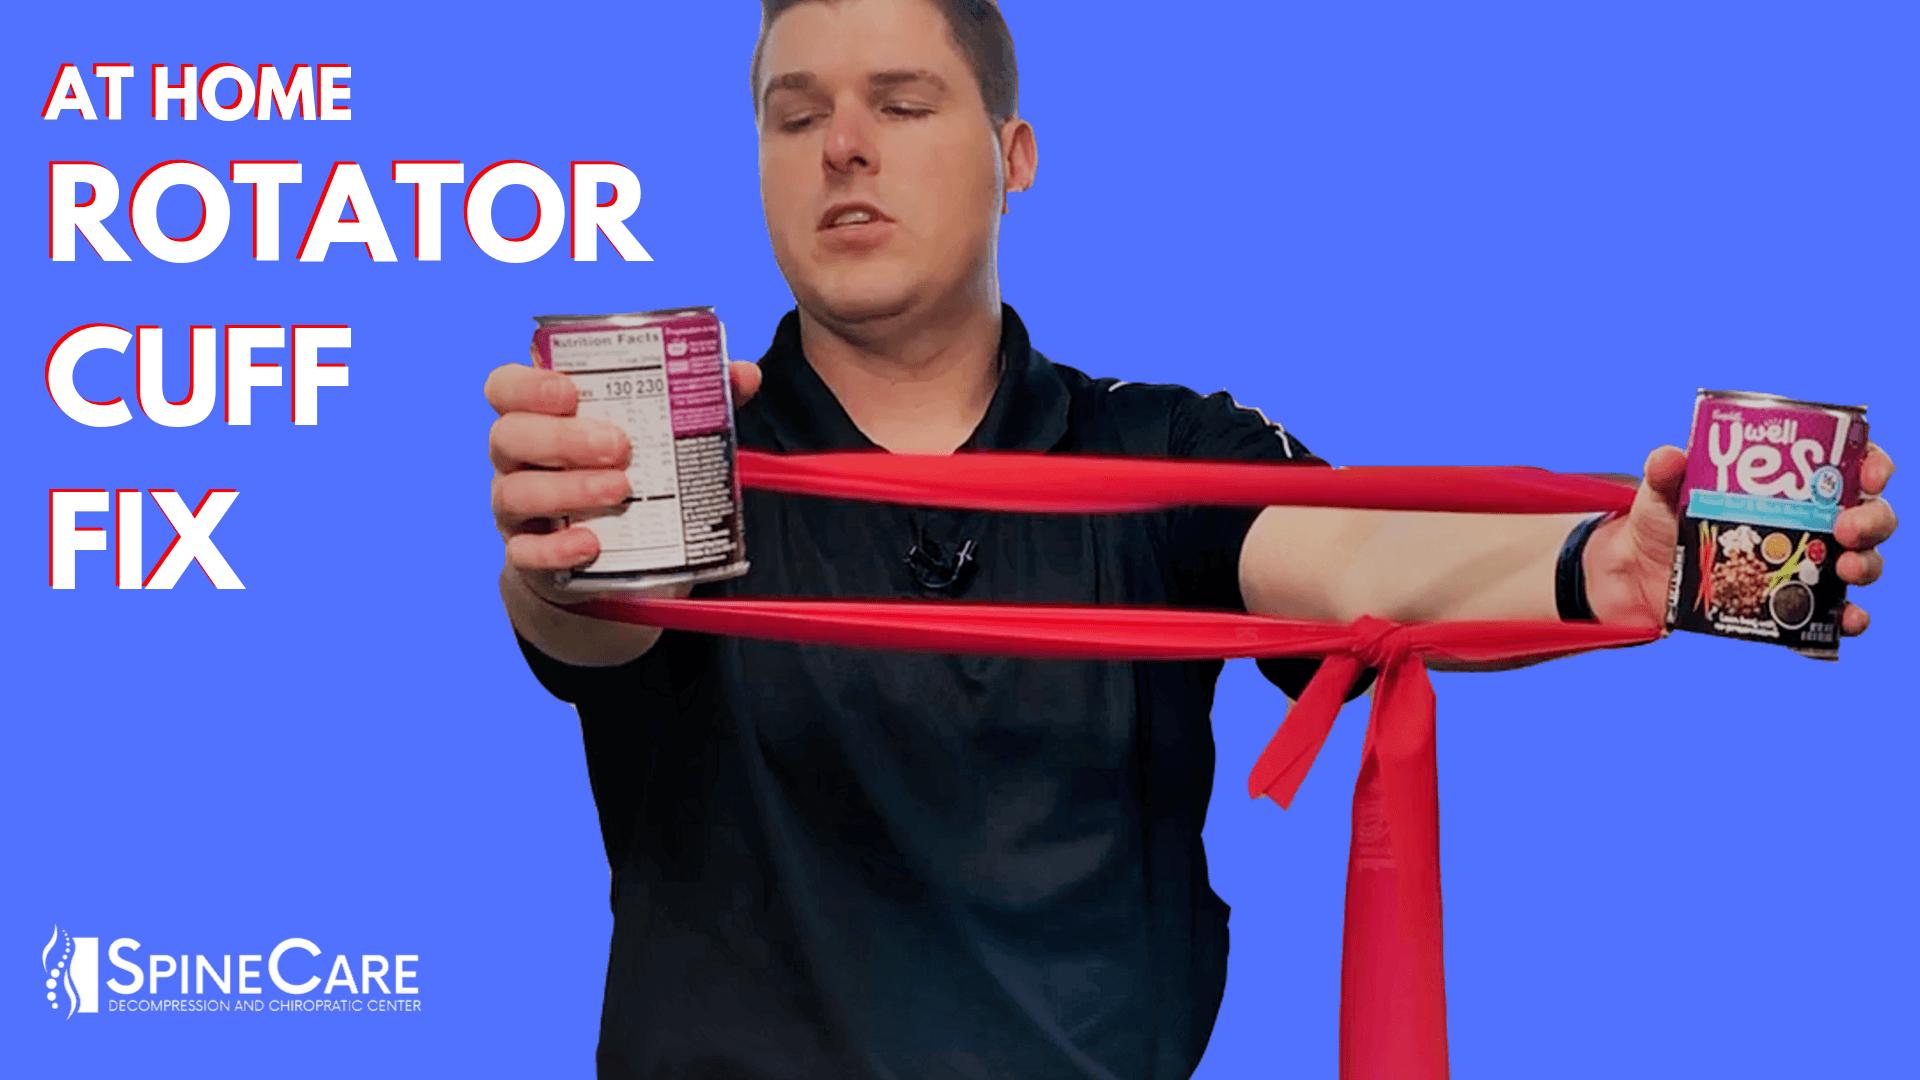 Rotator Cuff Injury Treatment (AT HOME) | St. Joseph, MI Chiropractor